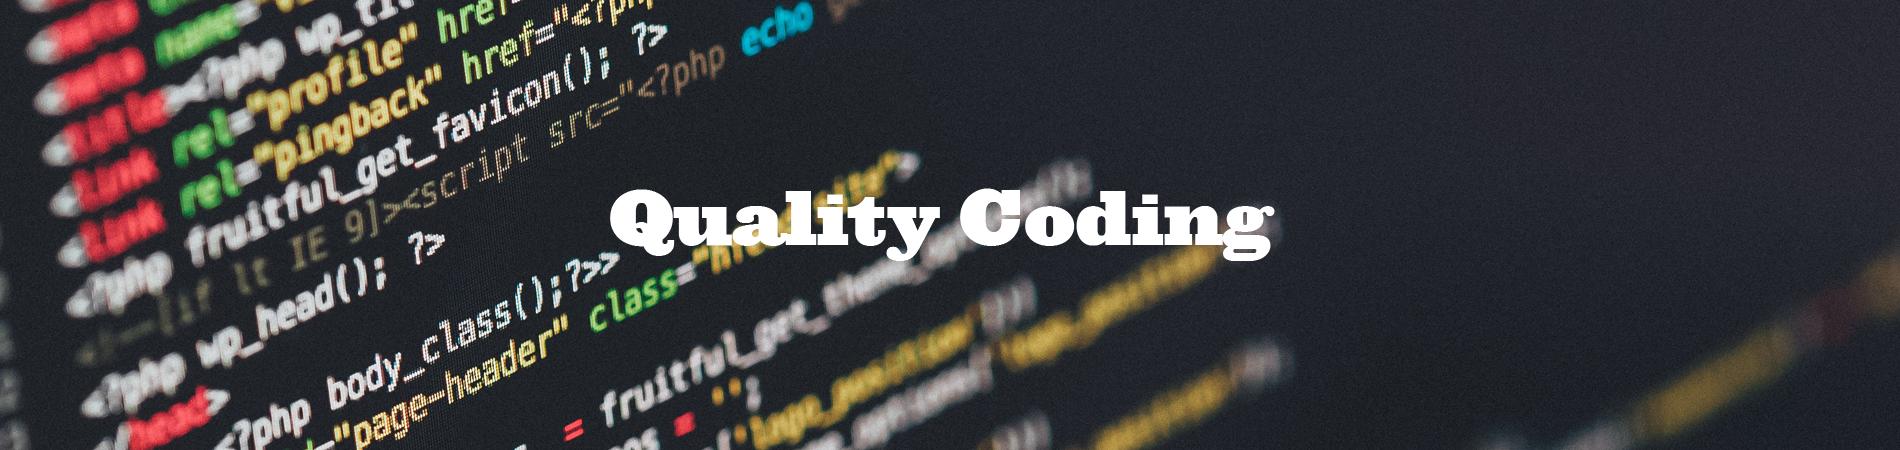 quality-coding2